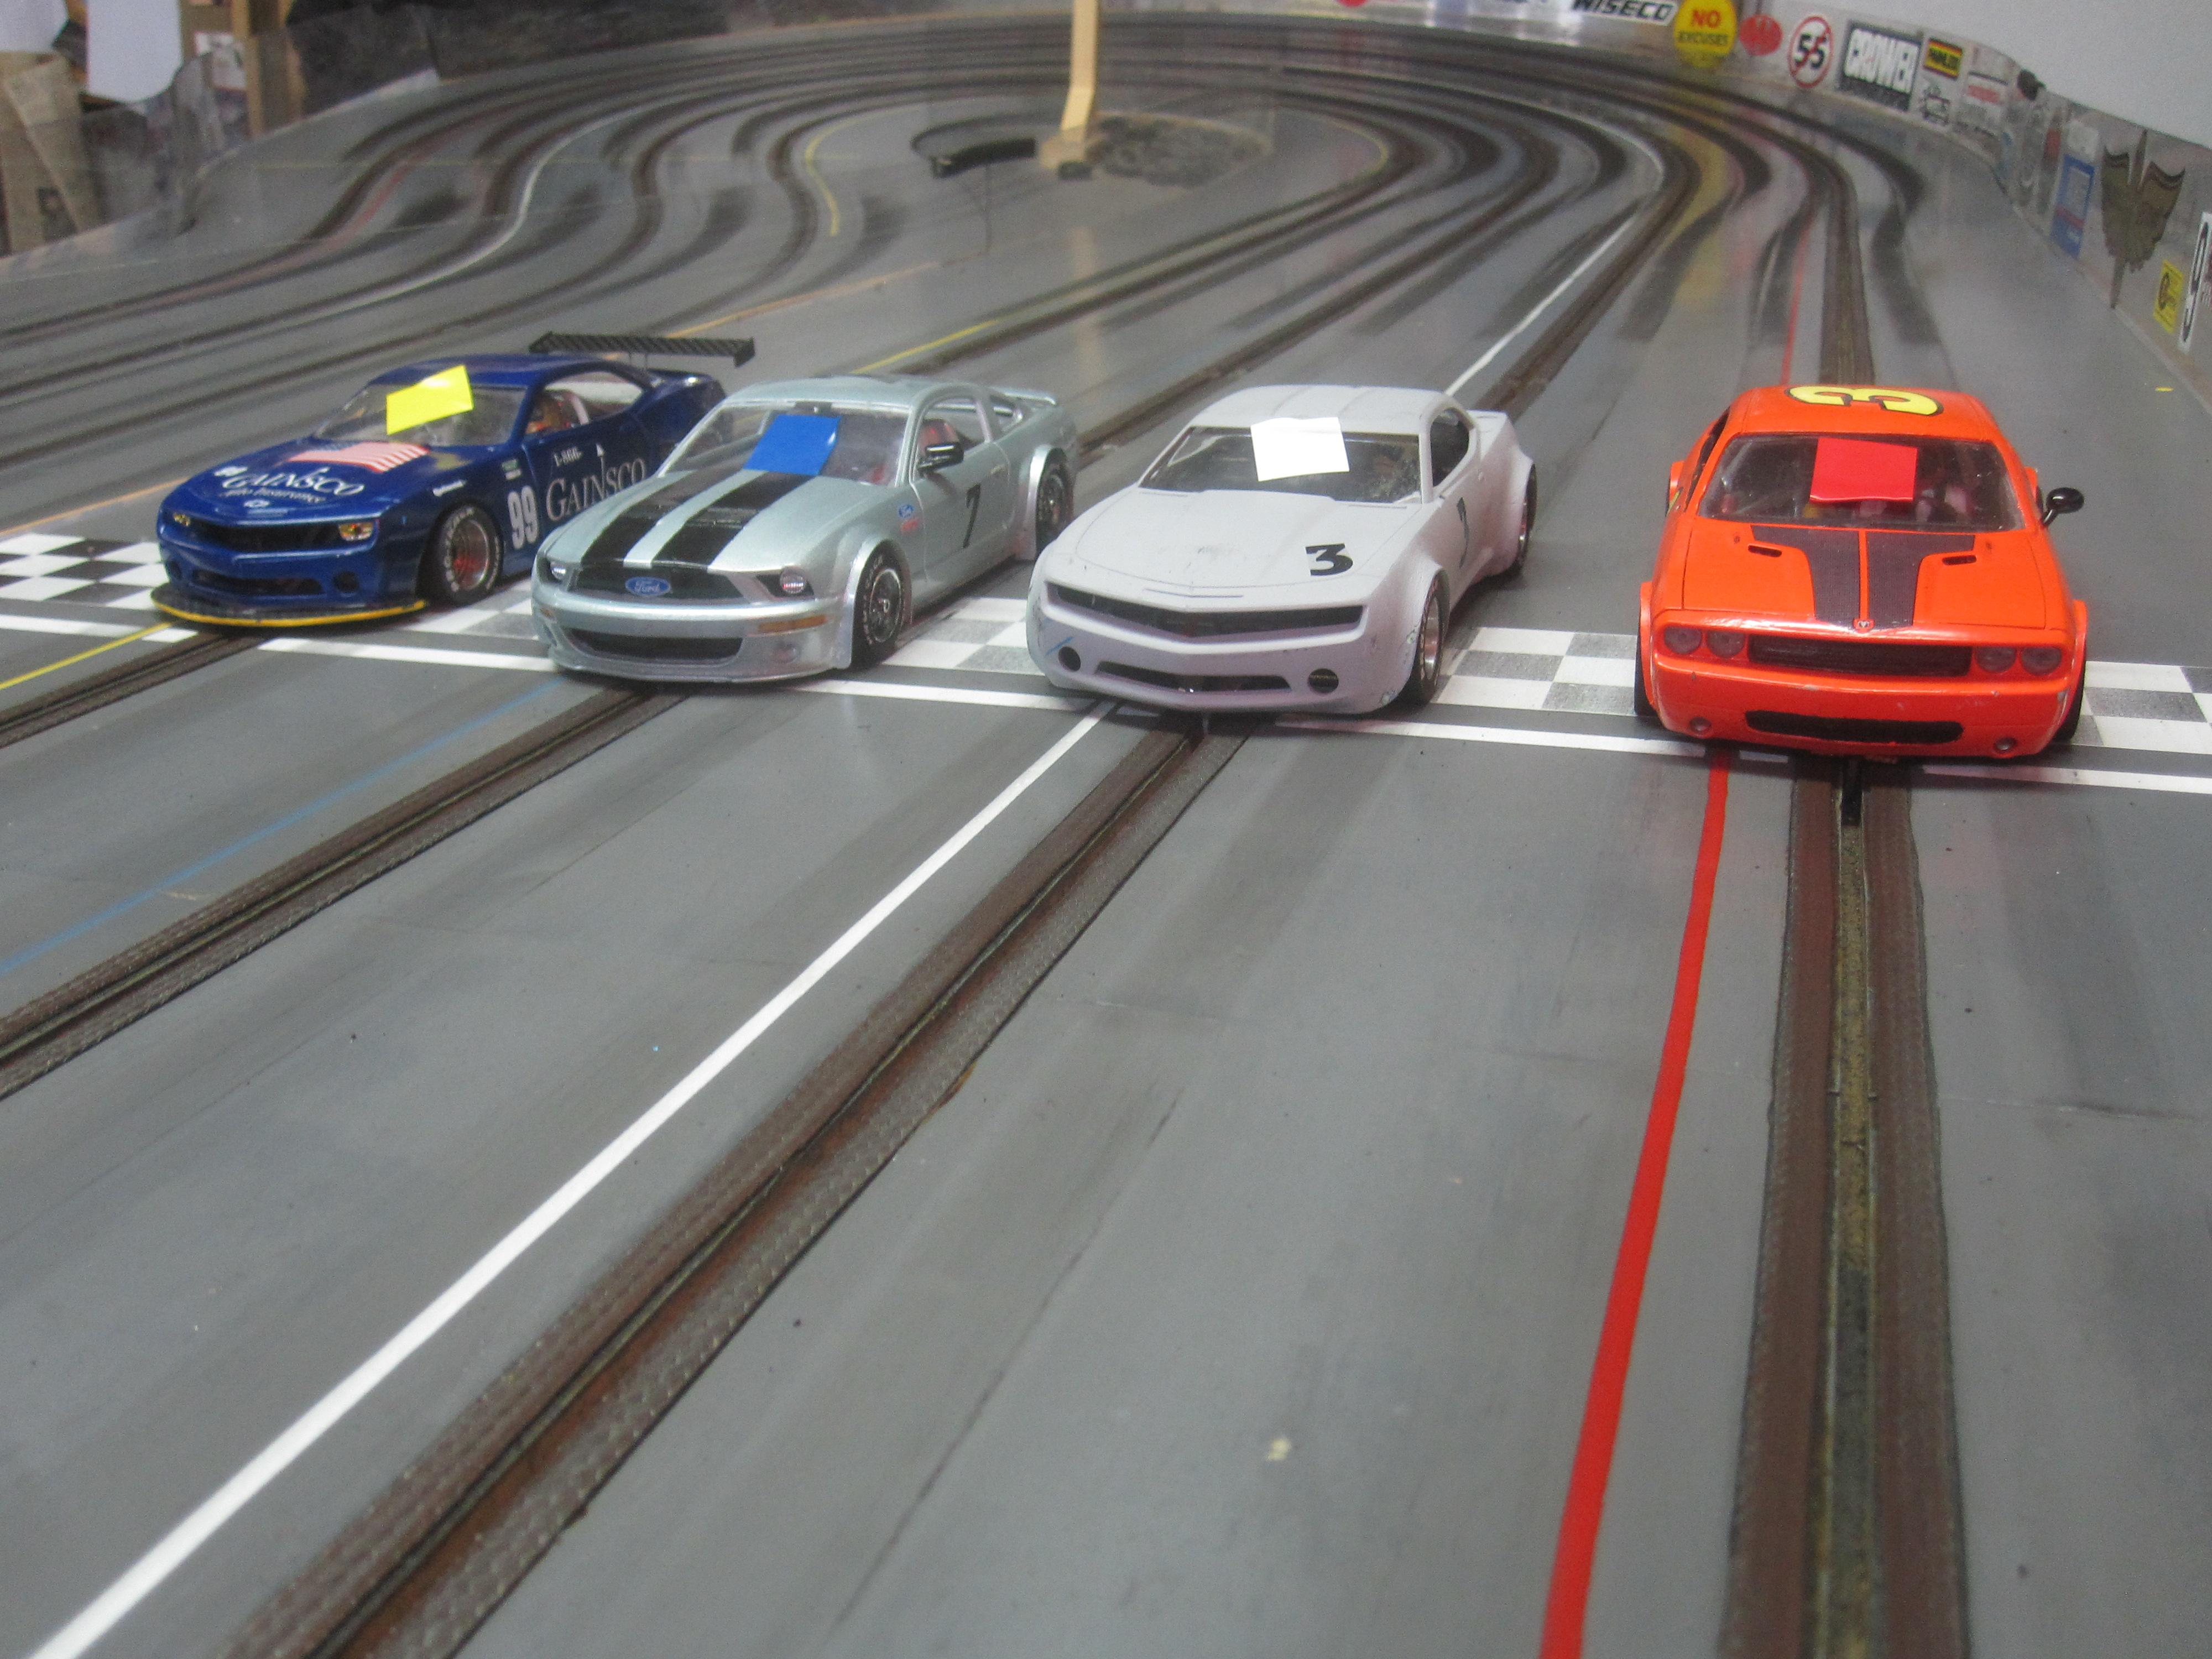 http://www.naste.org/members/bill/RaceResultsTA2o.jpg